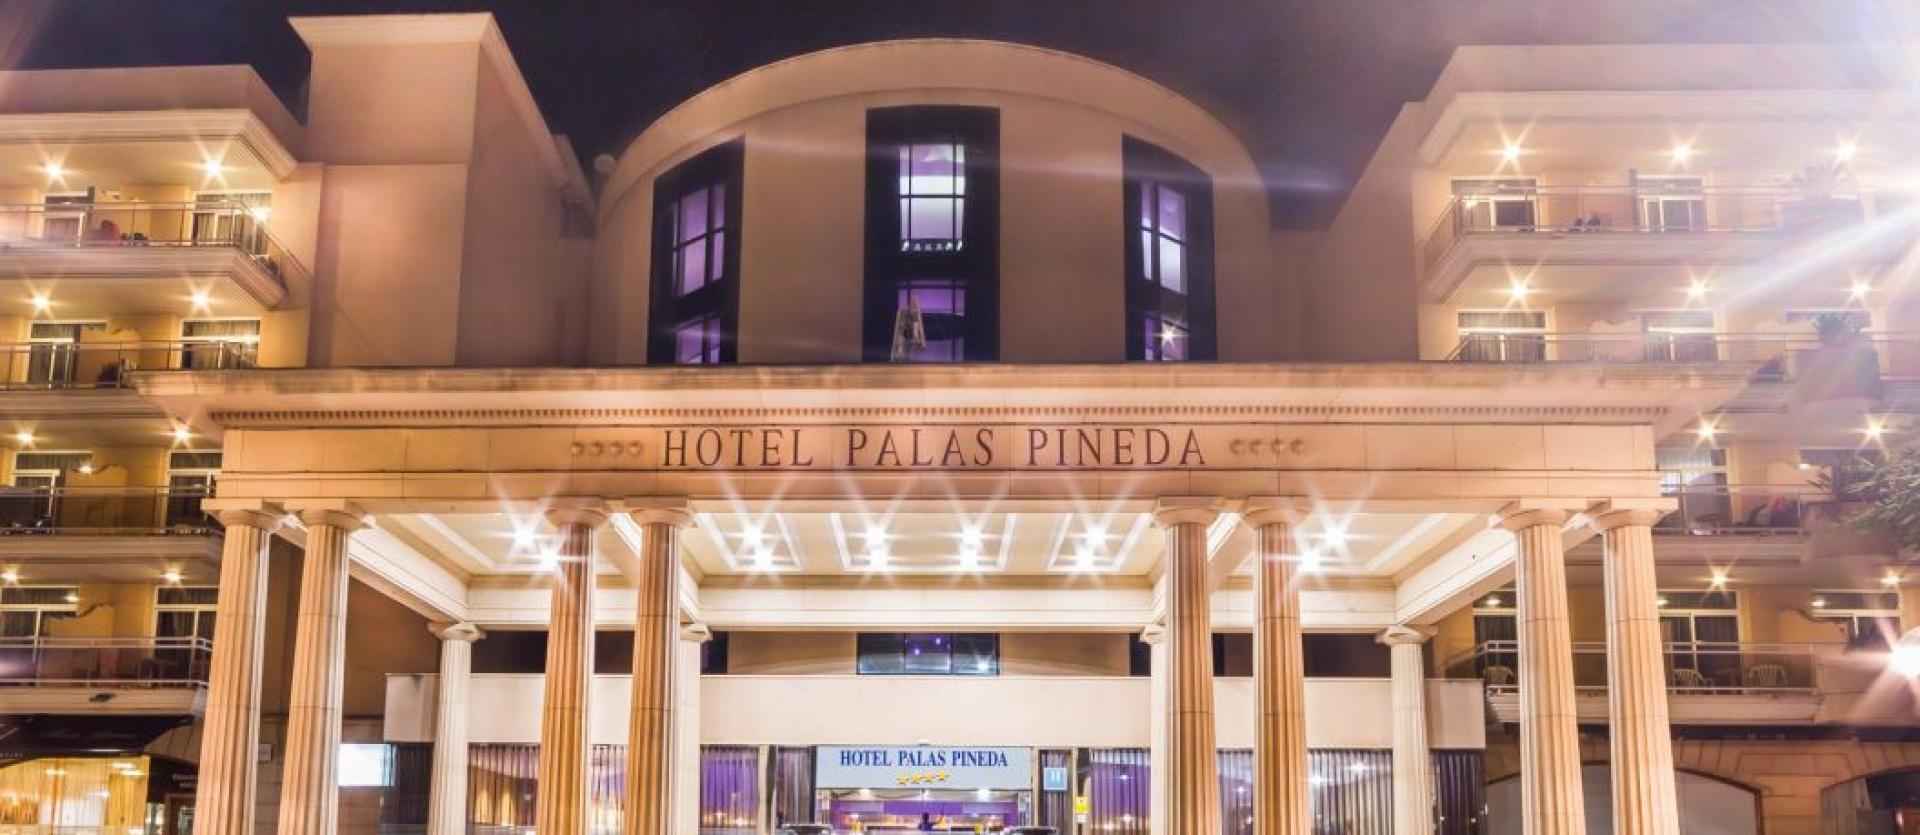 HOTEL PALAS PINEDA ****